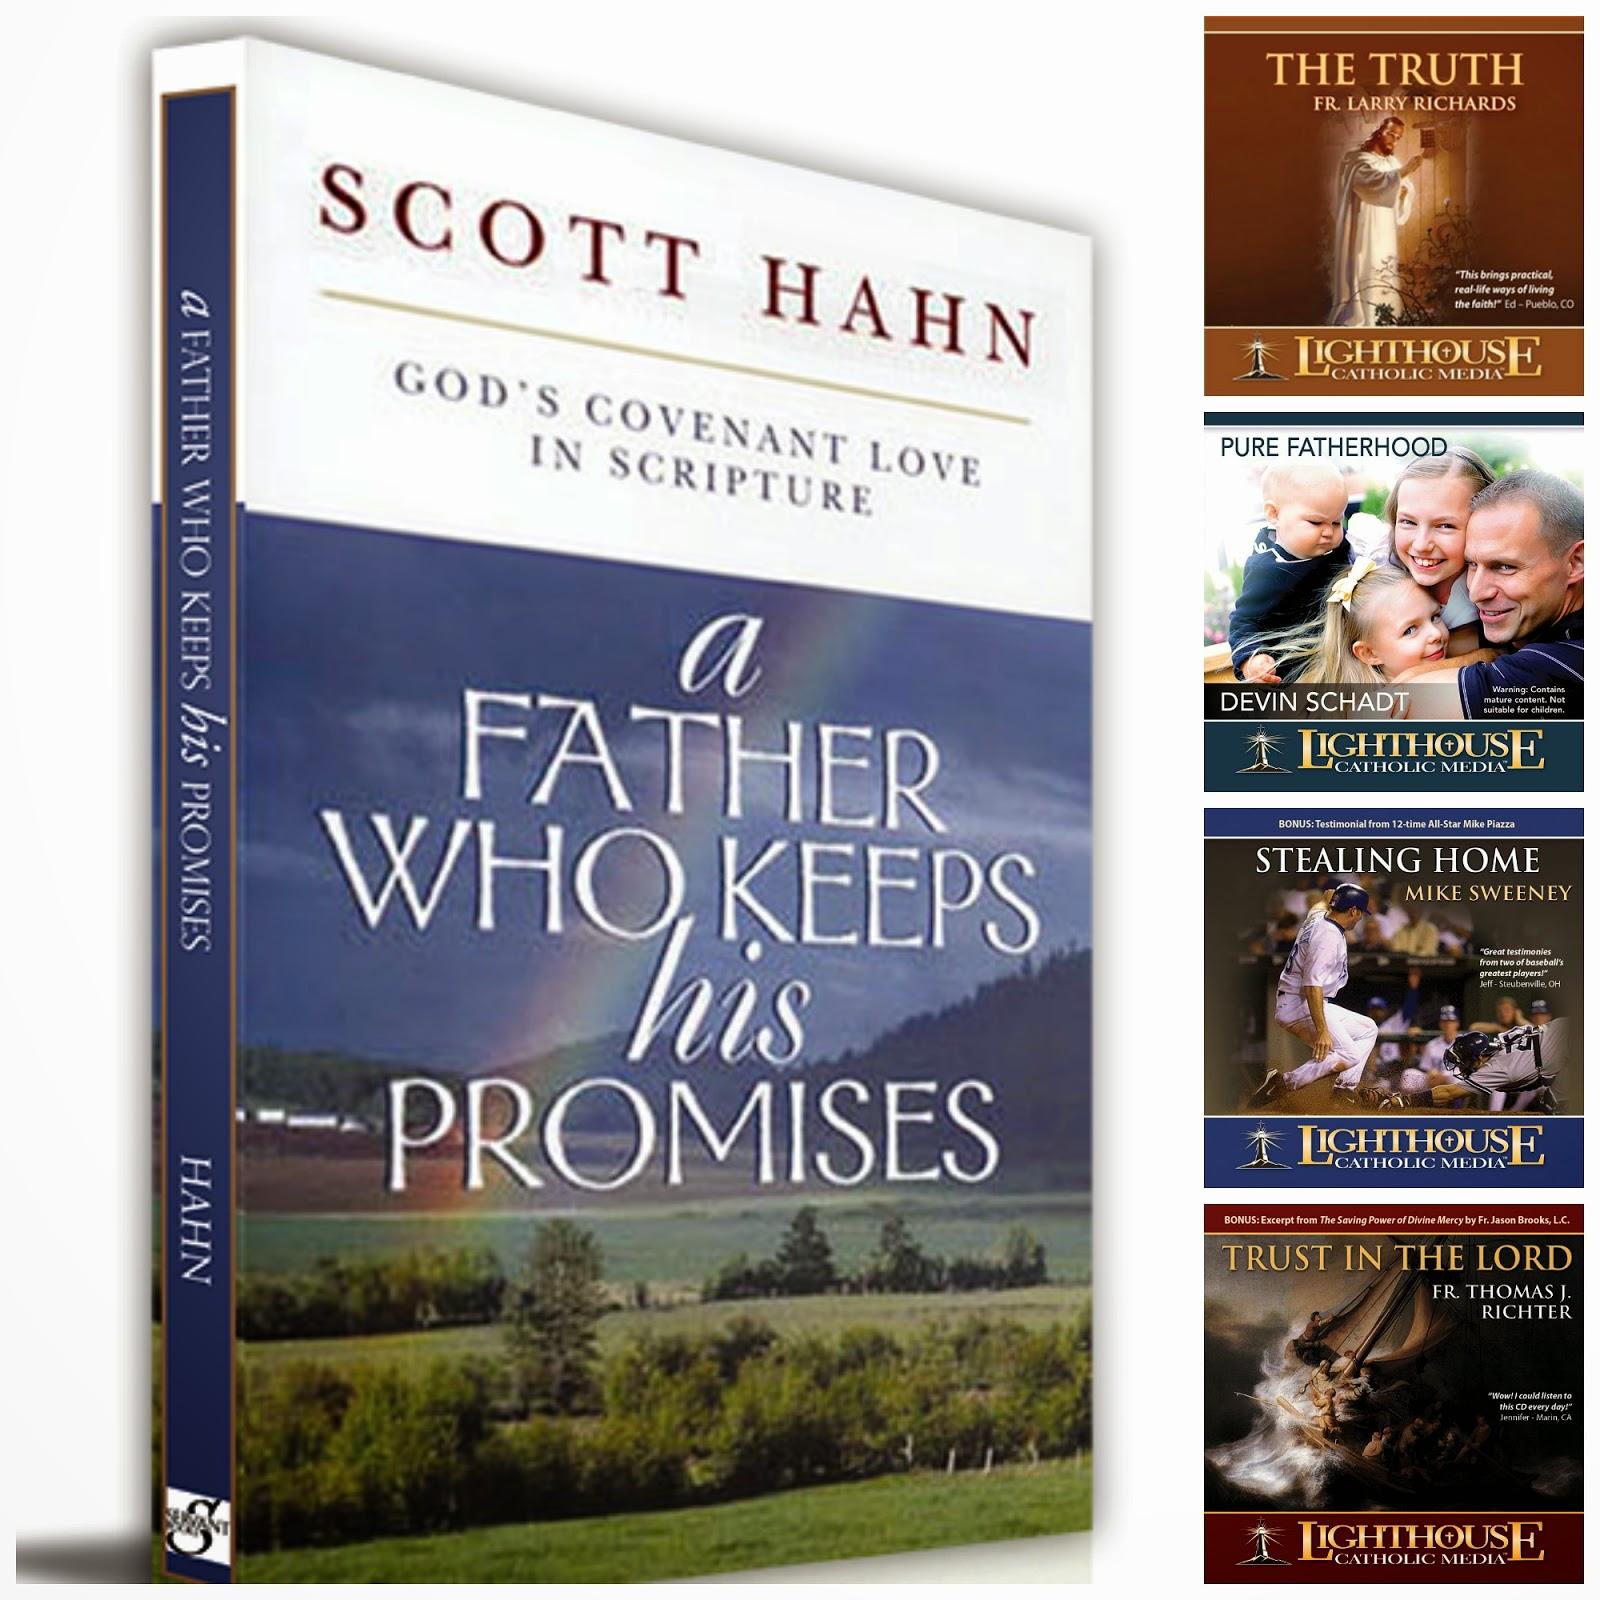 http://saints365.blogspot.com/2014/06/lighthouse-catholic-media-fathers-day.html